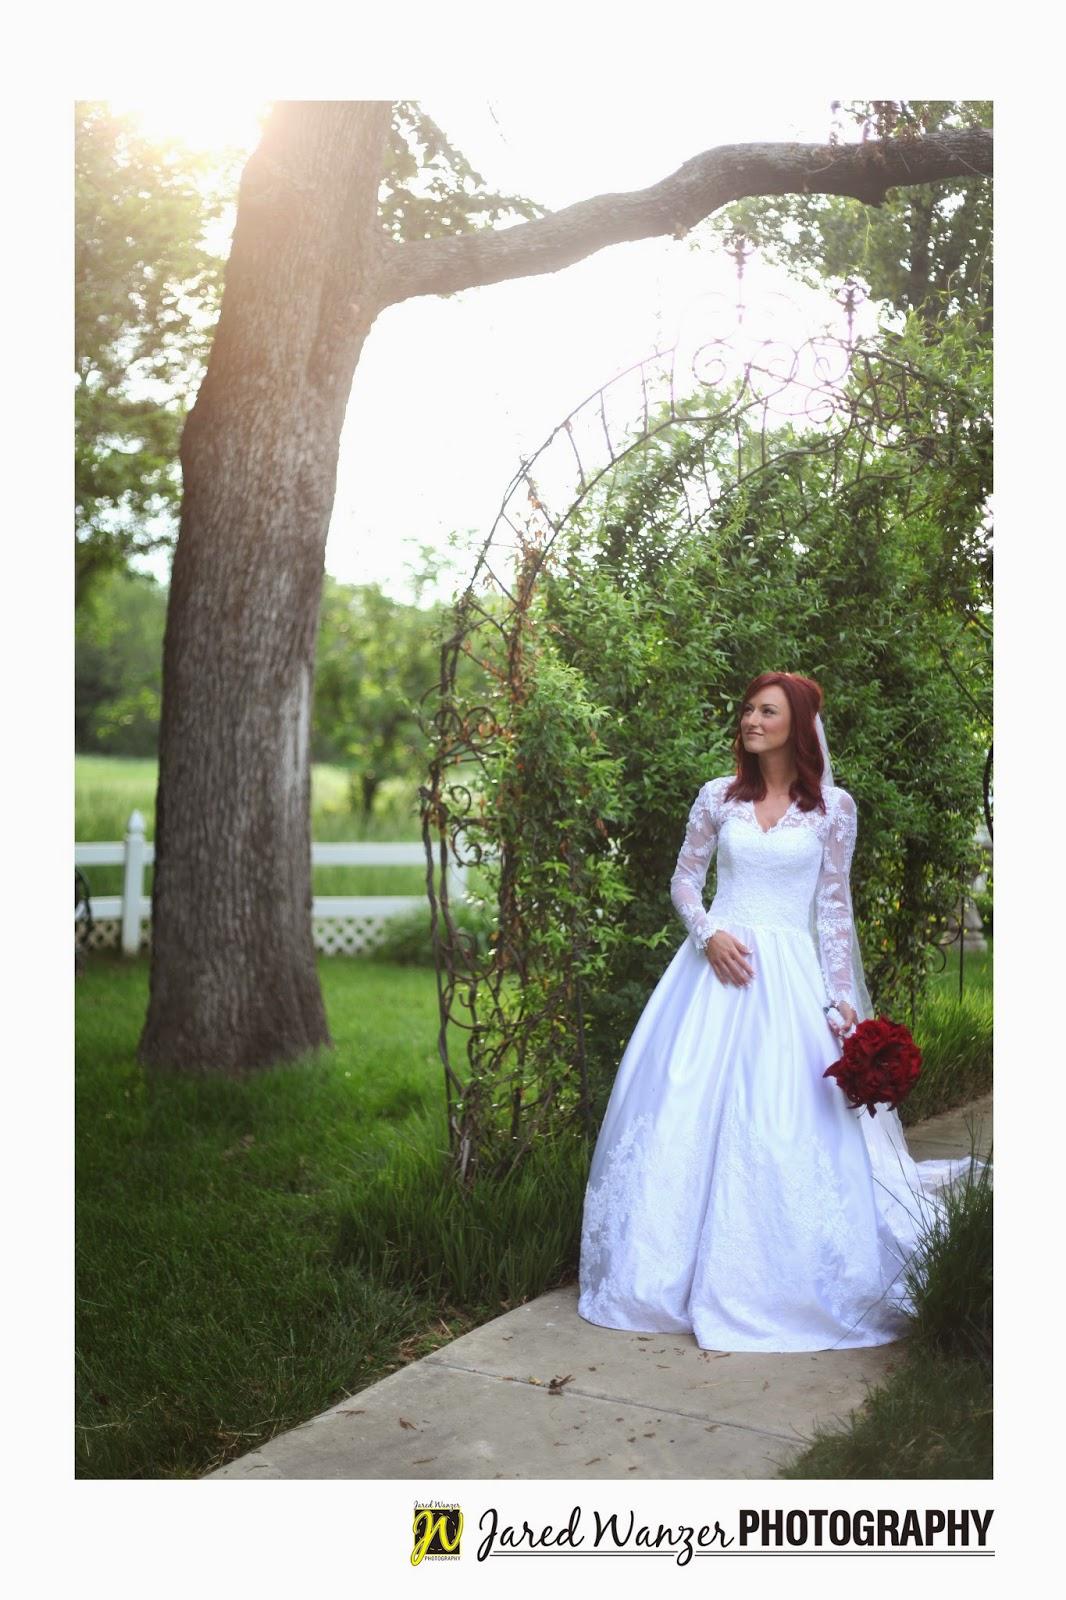 Jared Wanzer Photography CHRIS BRITTNIE WEDDING OKLAHOMA